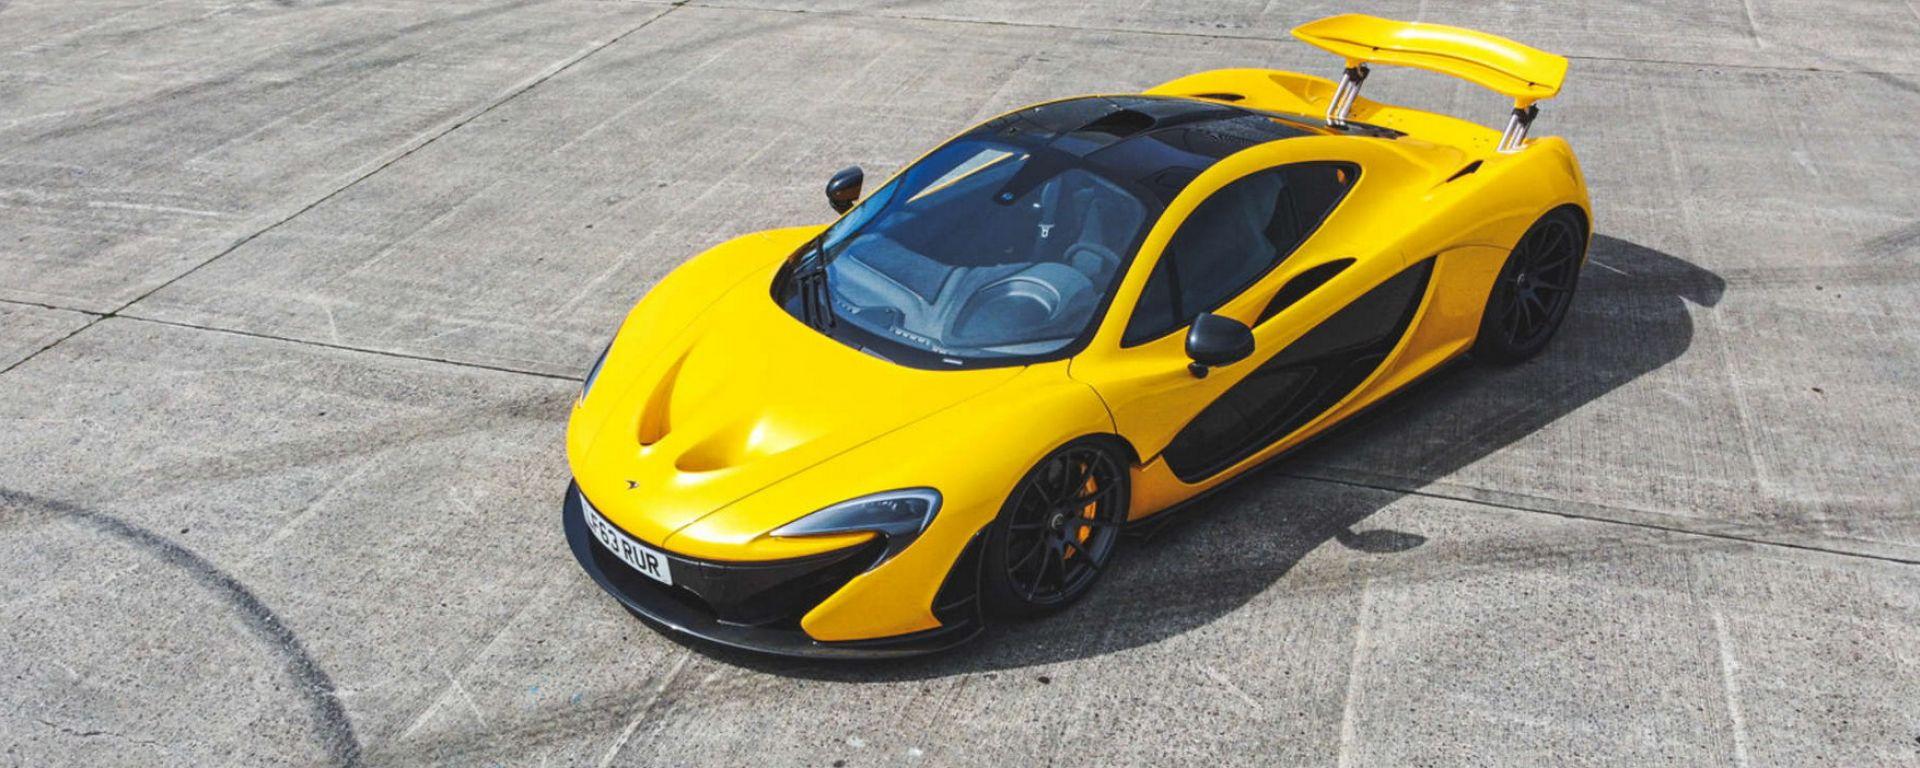 All'asta la prima McLaren P1 uscita dagli stabilimenti di Woking